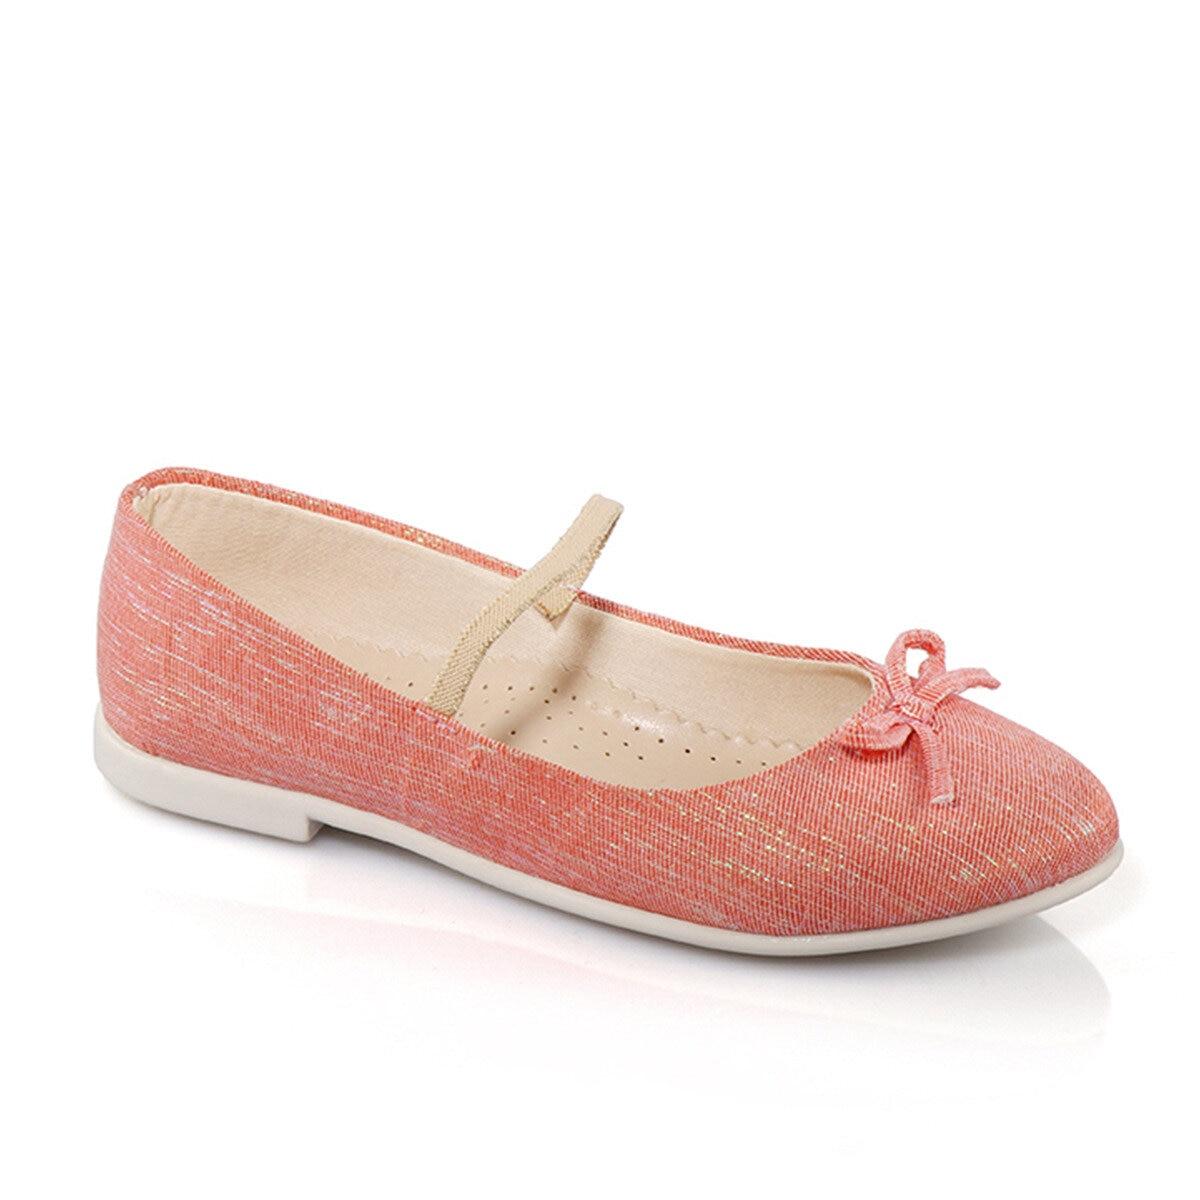 FLO 913.18Y. 736 FB Coral Female Child Ballerina VICCO